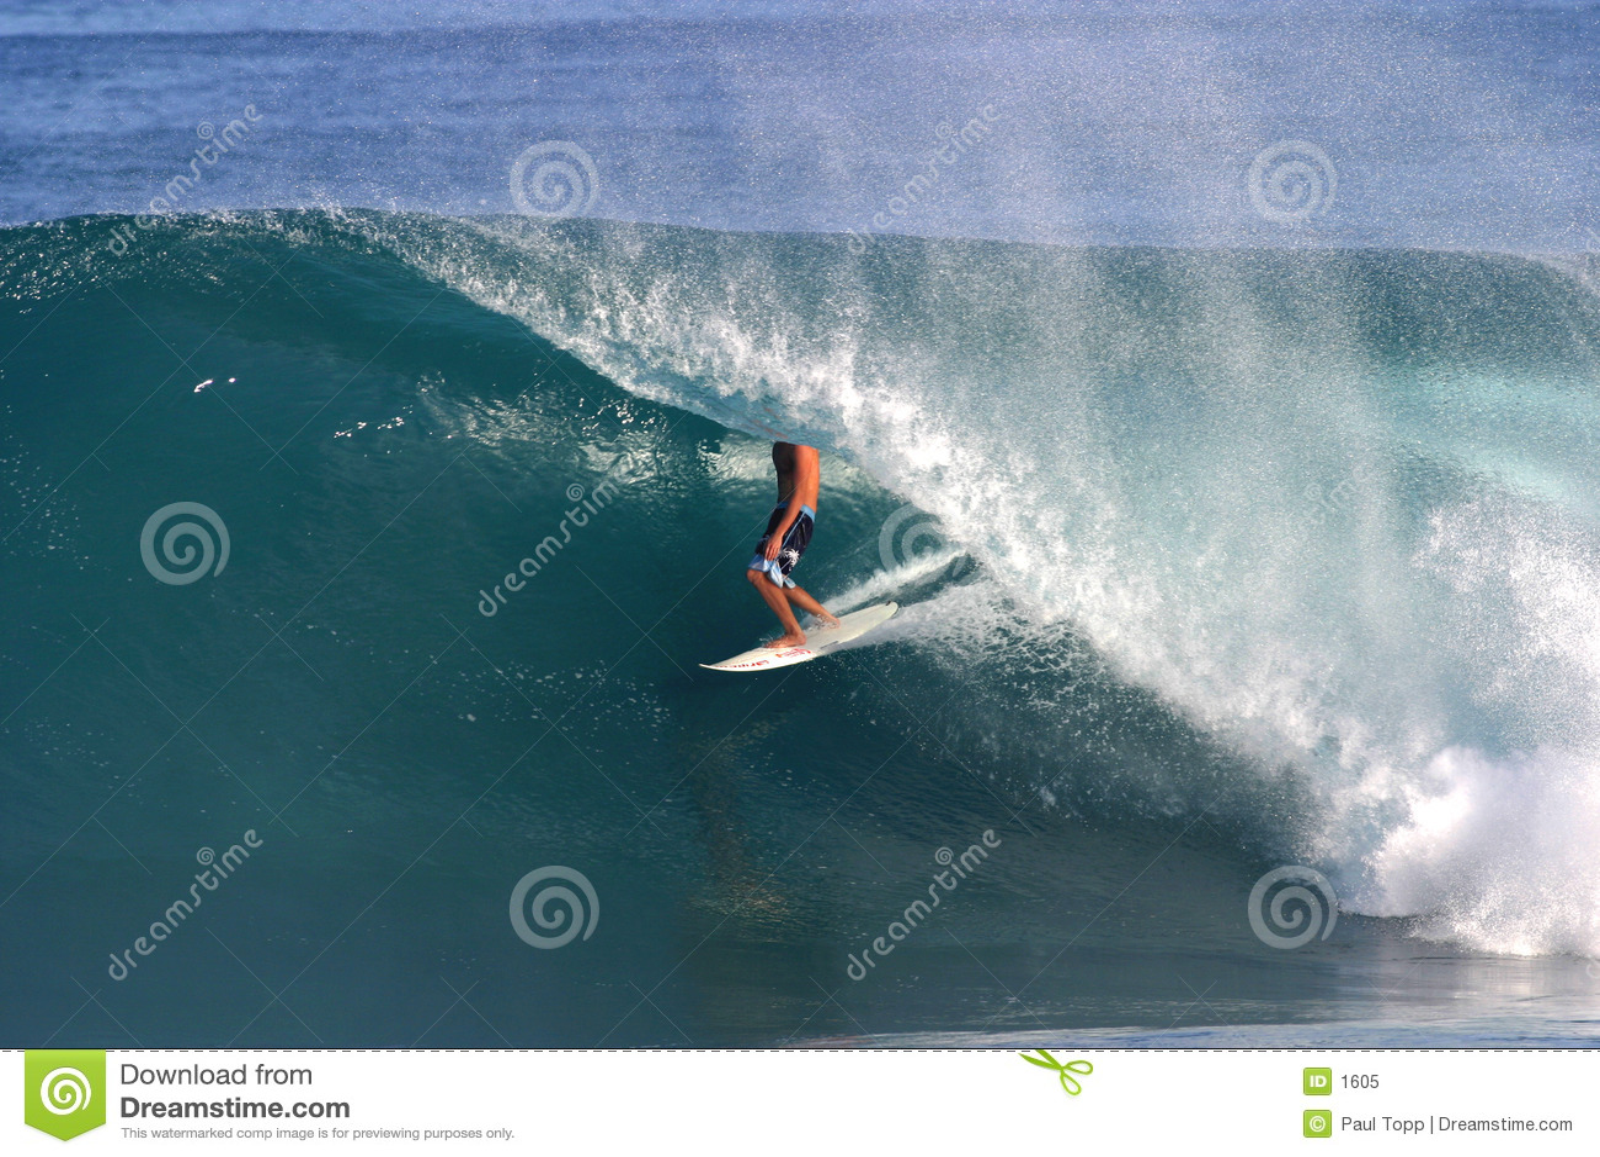 Surfer Surfing Backdoor Pipeline in Hawaii